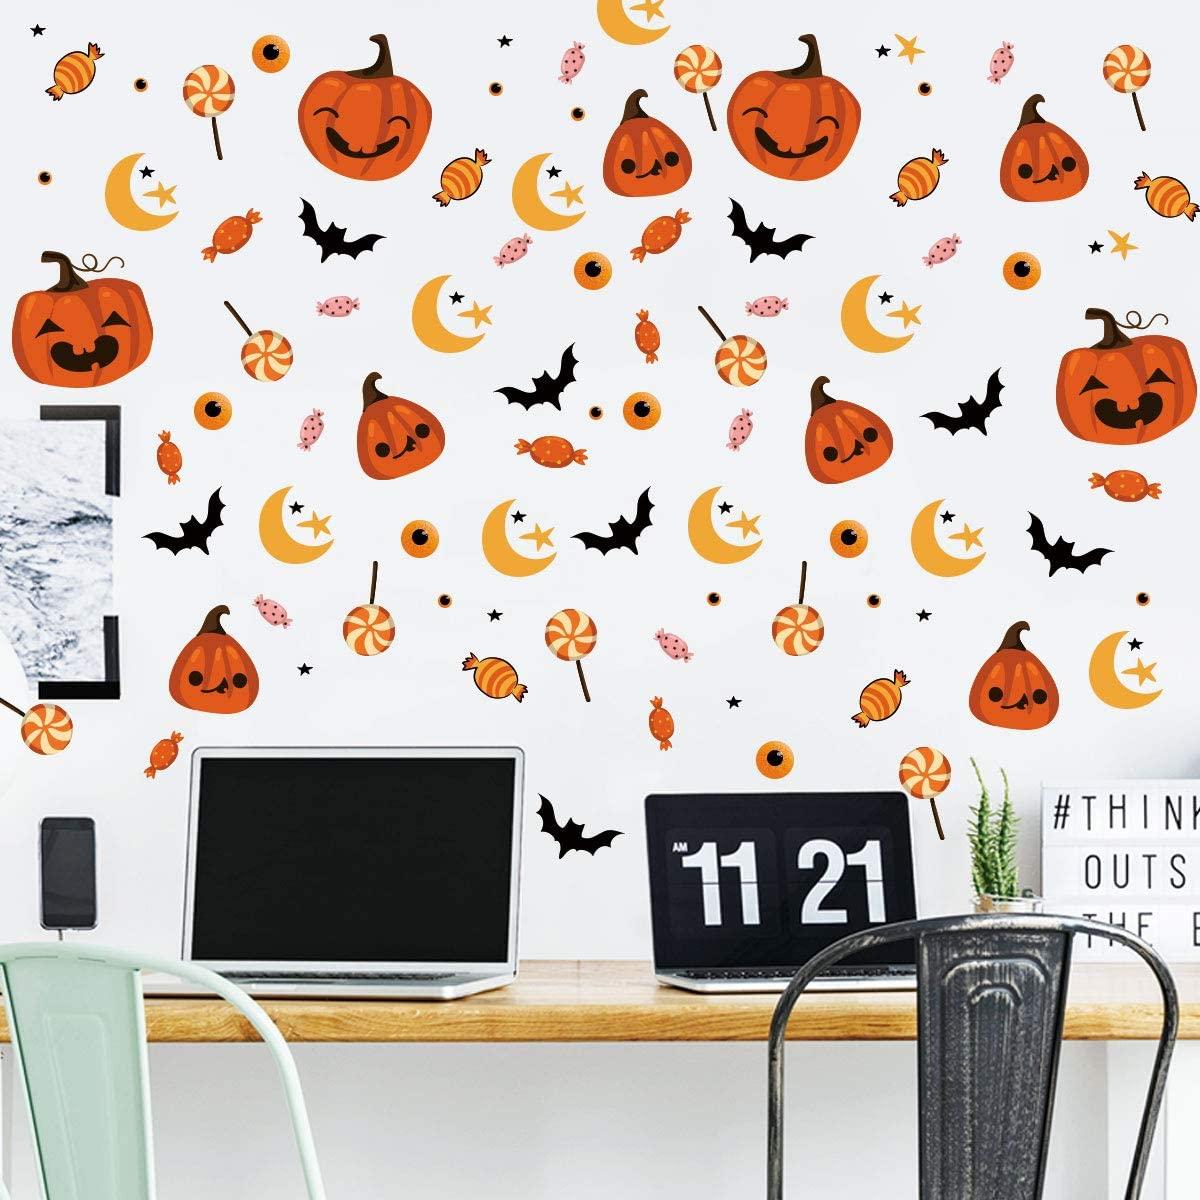 6 Set Reative Halloween Wall Stickers,Funny Pumpkin+Lollipop Wall Decal for NurserySchool Kids Room Living Room Wall Art Decor